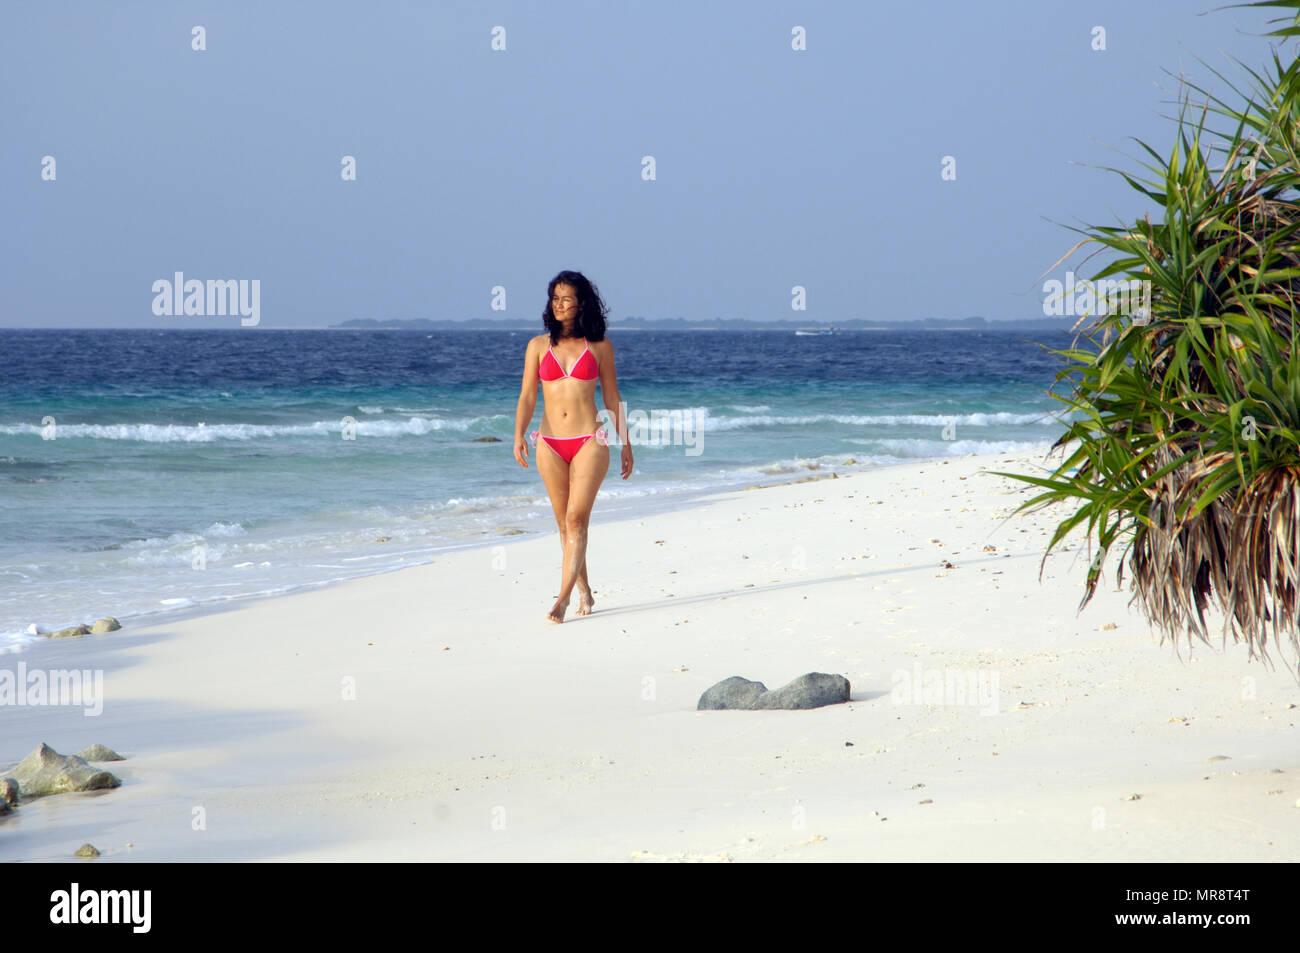 Maldivas, praia a pé | Malediven, Strandspaziergang Imagens de Stock